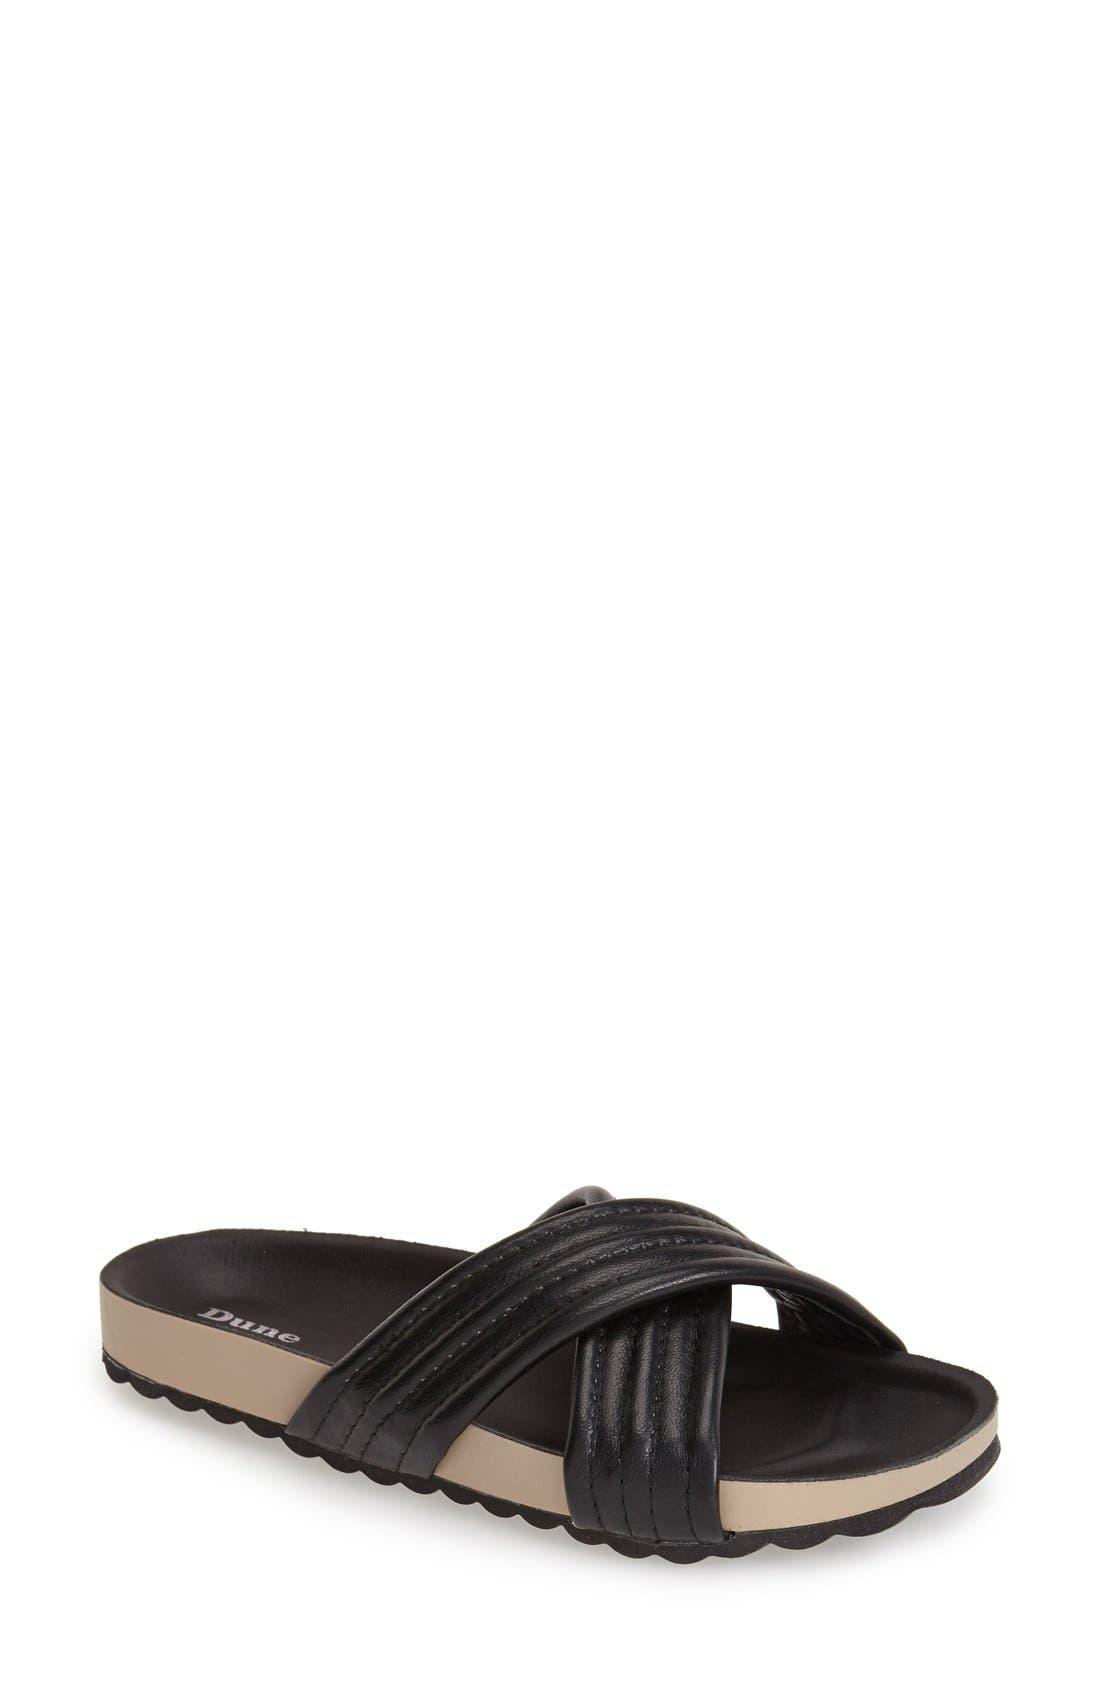 DUNE LONDON 'Jolenes' Leather Slide Sandal, Main, color, 002